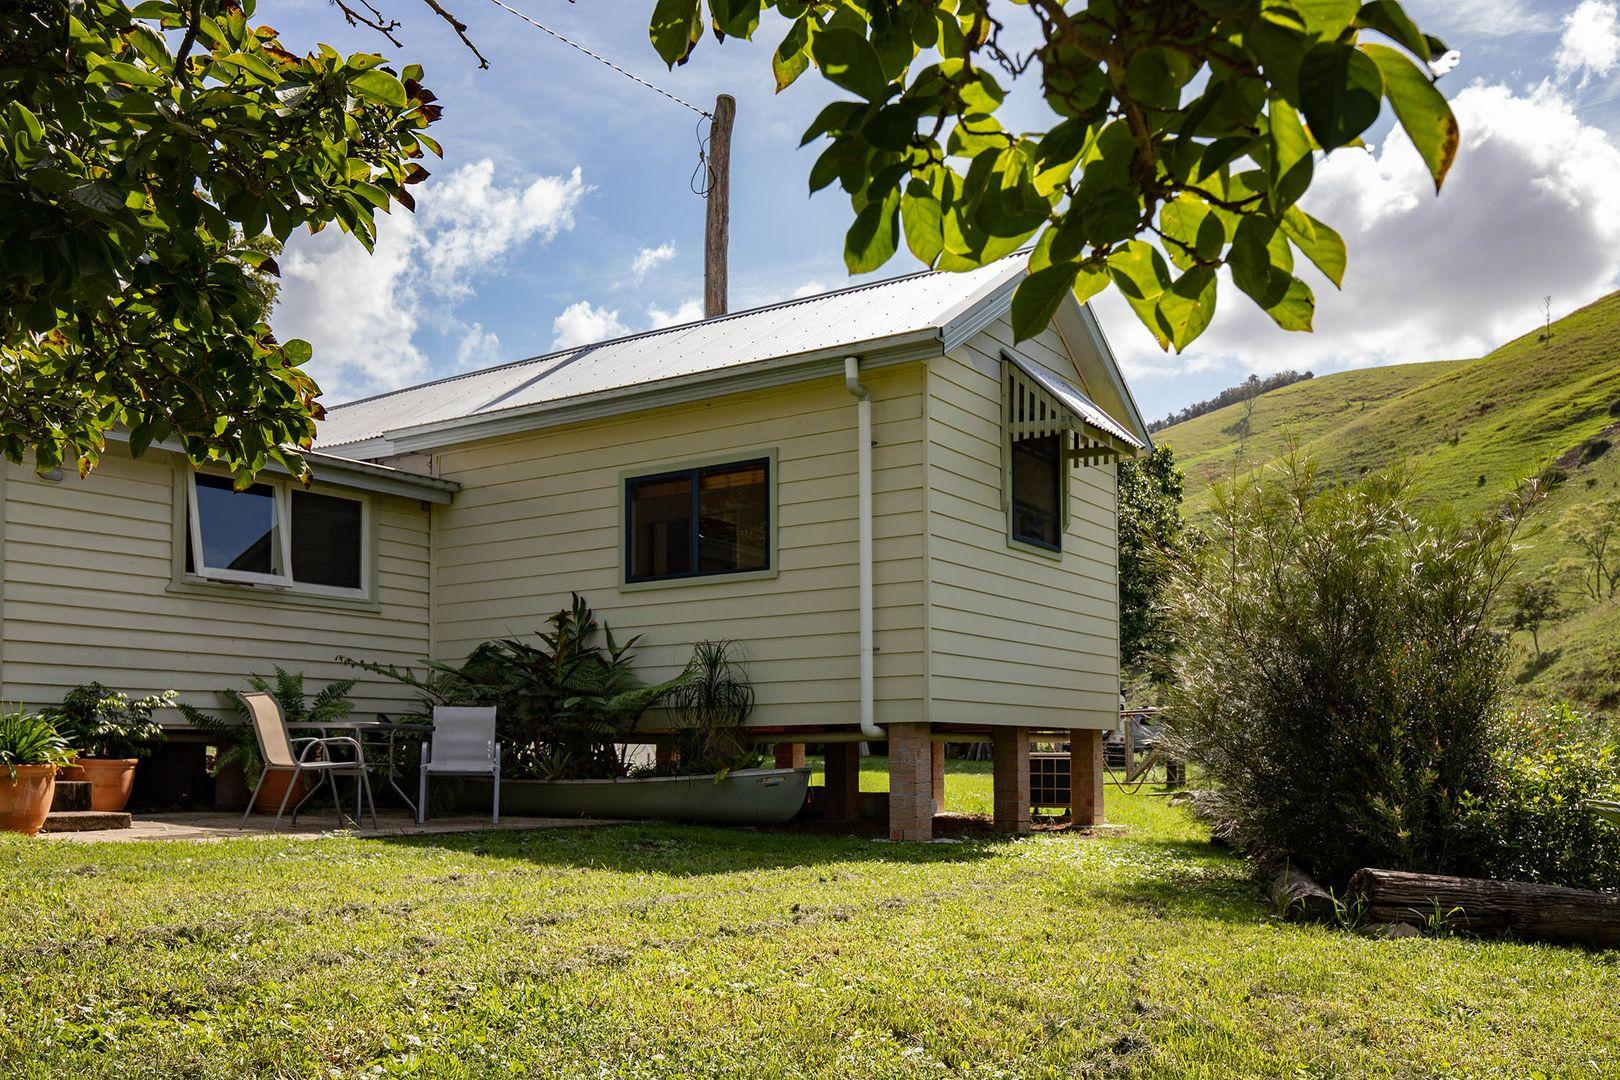 139 Testorellis, Copeland NSW 2422, Image 1